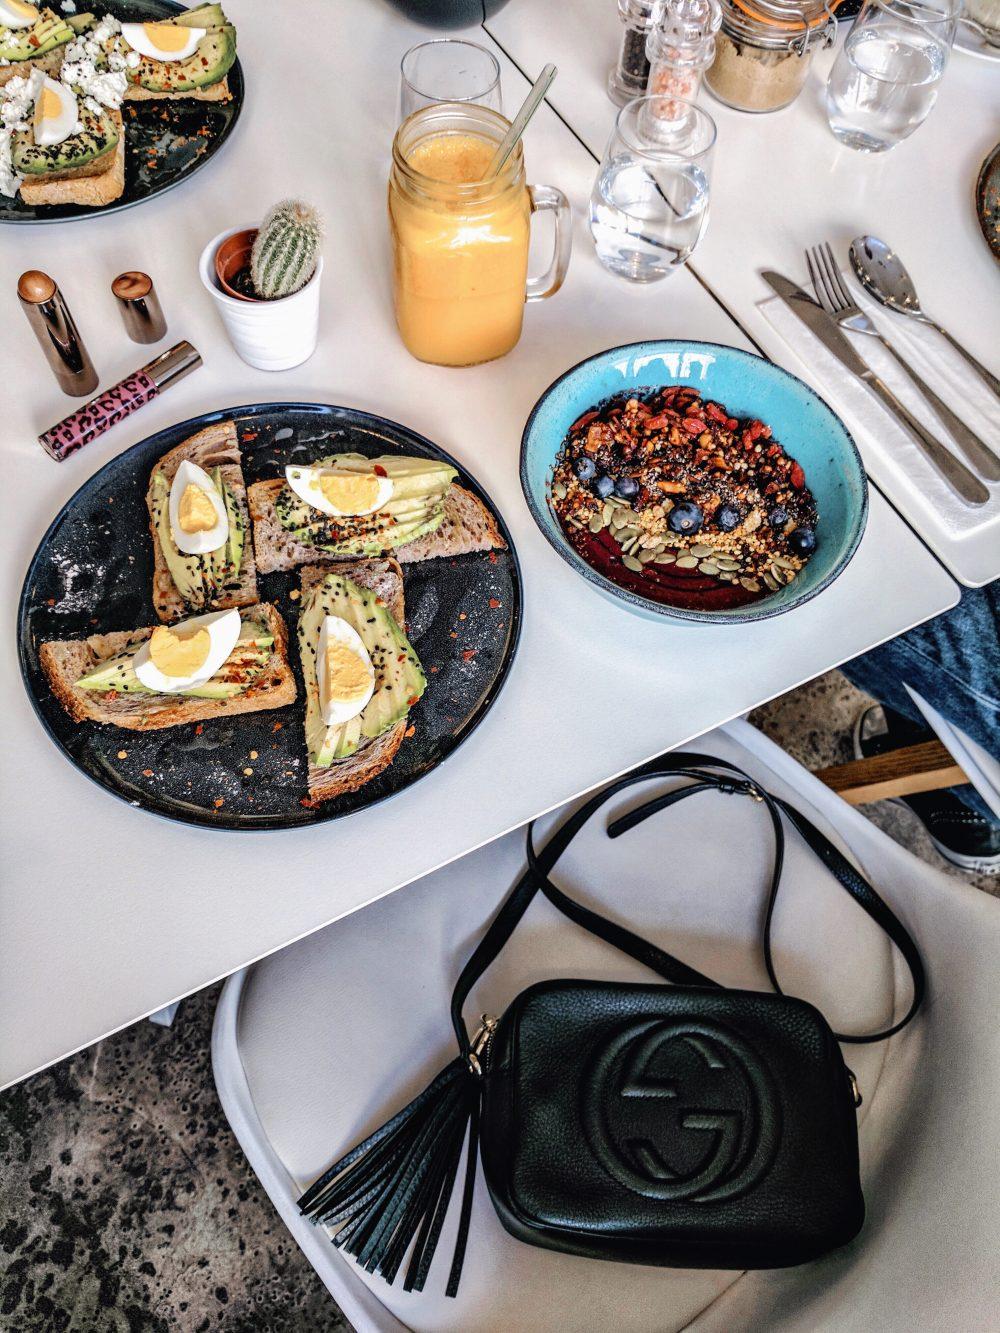 Whitney's Wonderland UK Top Food Blogger Best Brunch Spots in London on 2018 Jusu Brothers